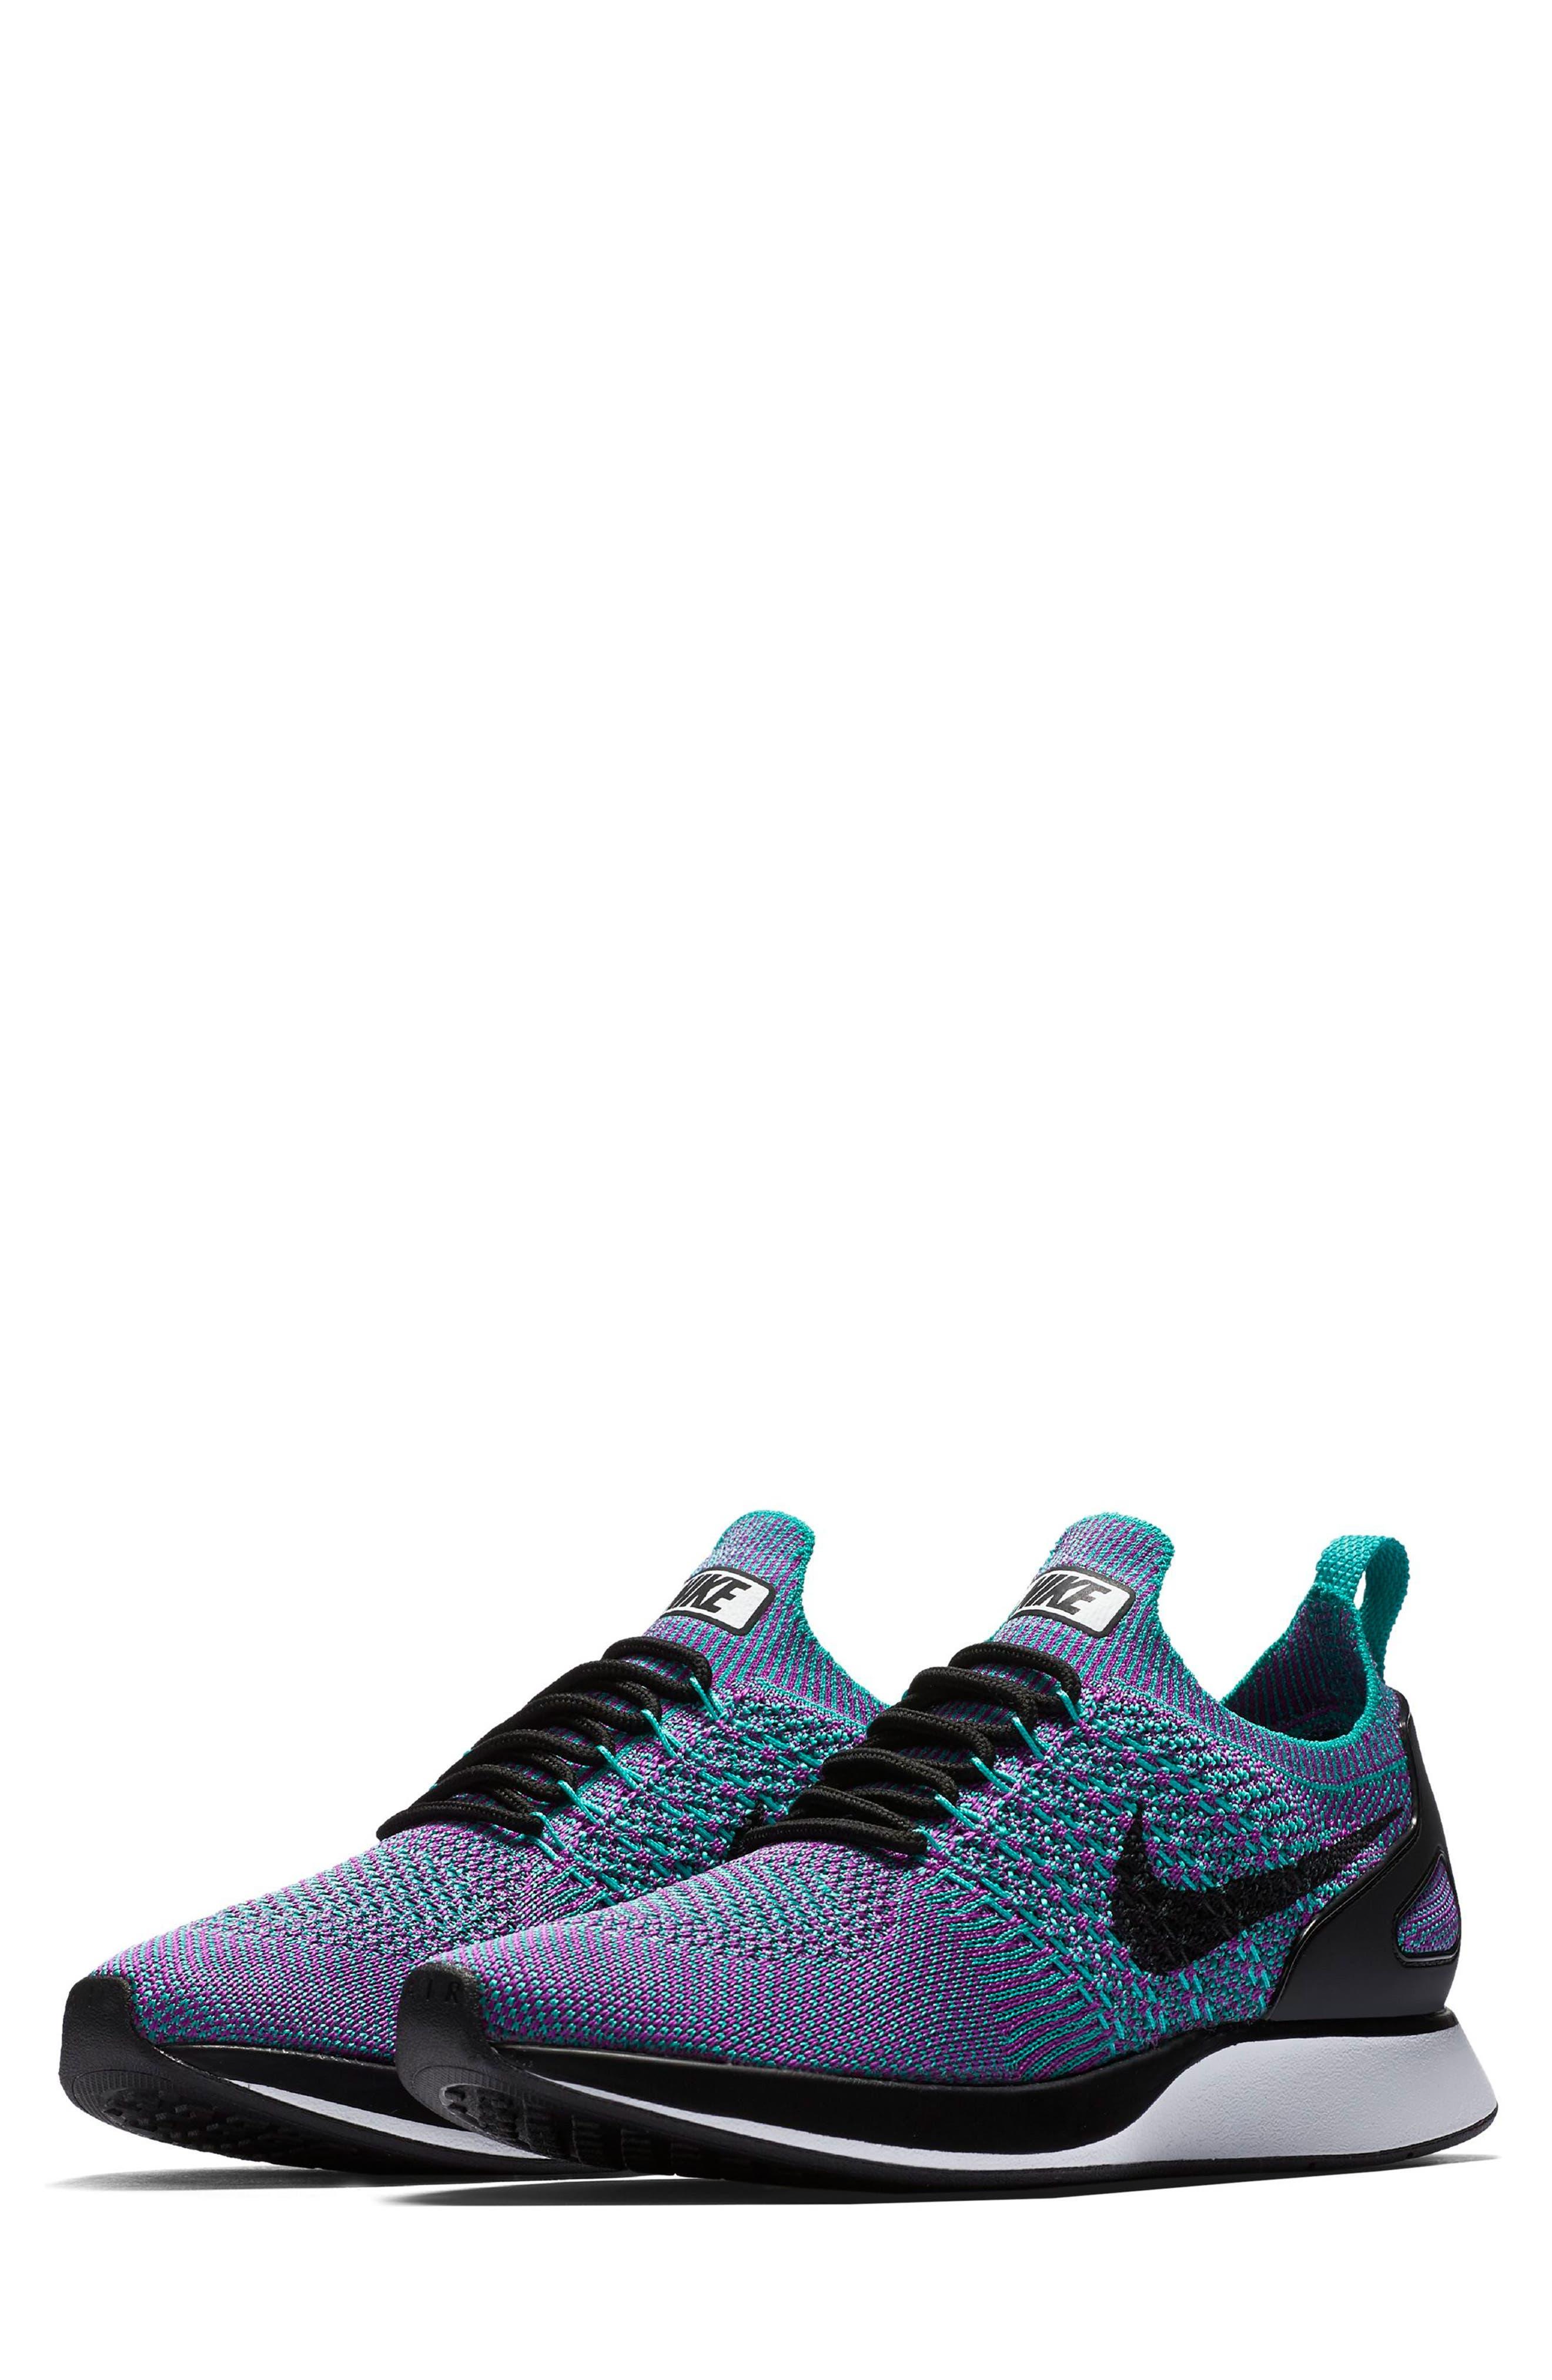 Air Zoom Mariah Flyknit Racer Sneaker,                         Main,                         color, CLEAR JADE/ BLACK